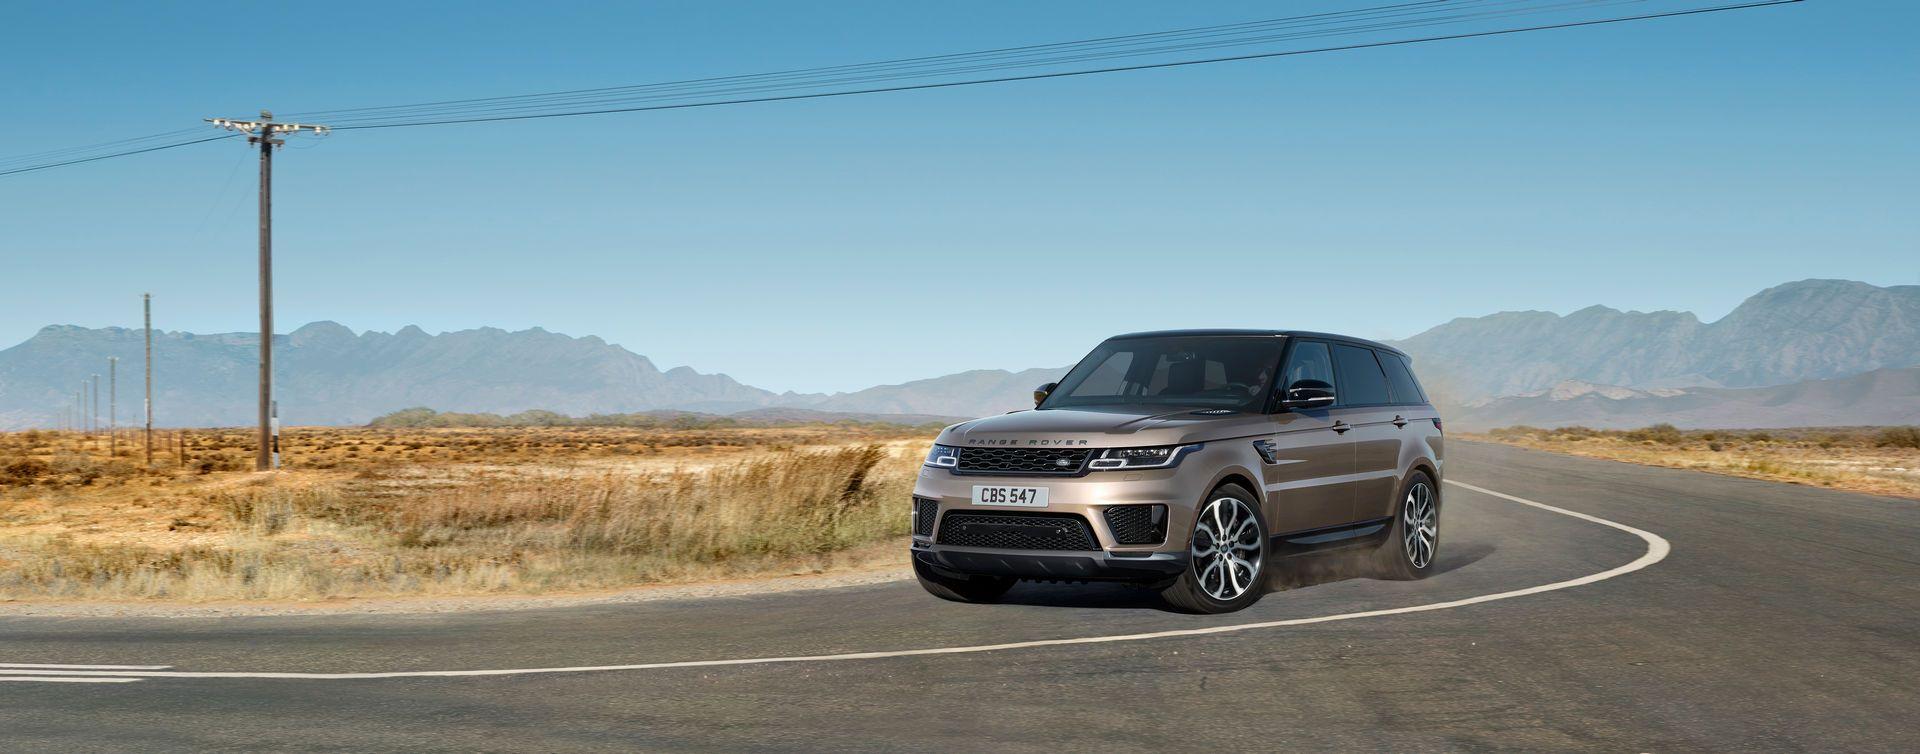 2021-Range-Rover-Sport-28